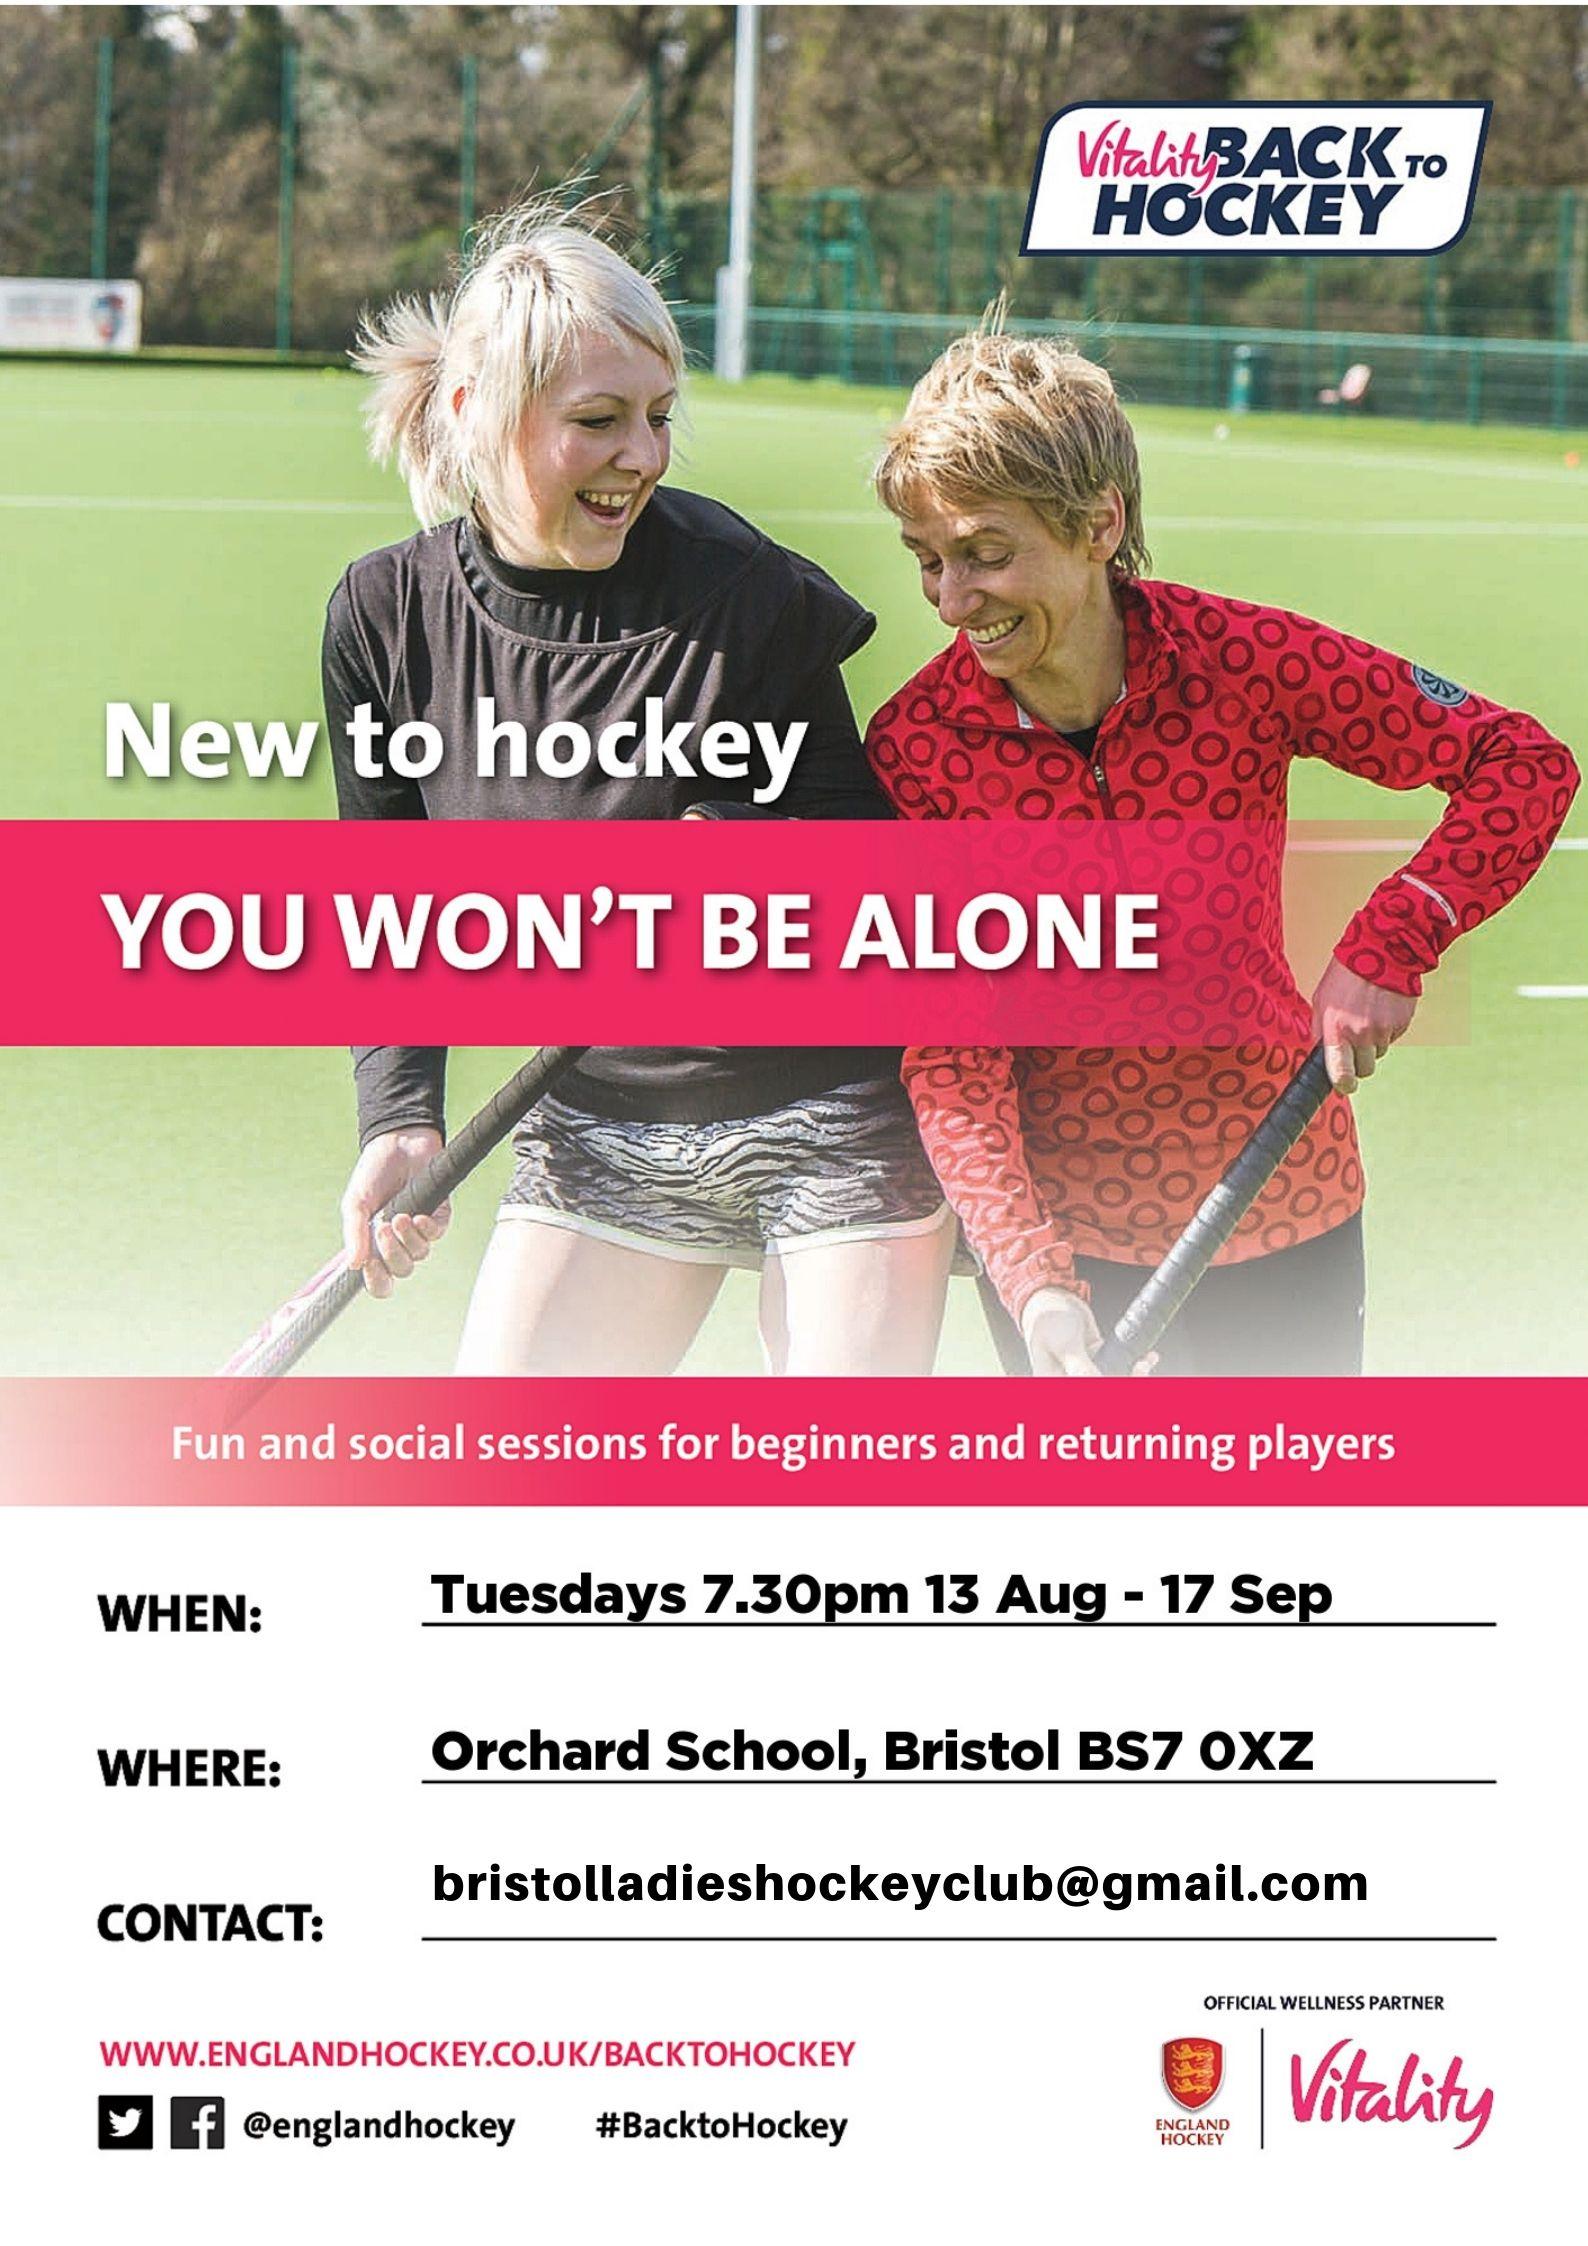 bristolladieshockeyclub@gmail.com.jpg